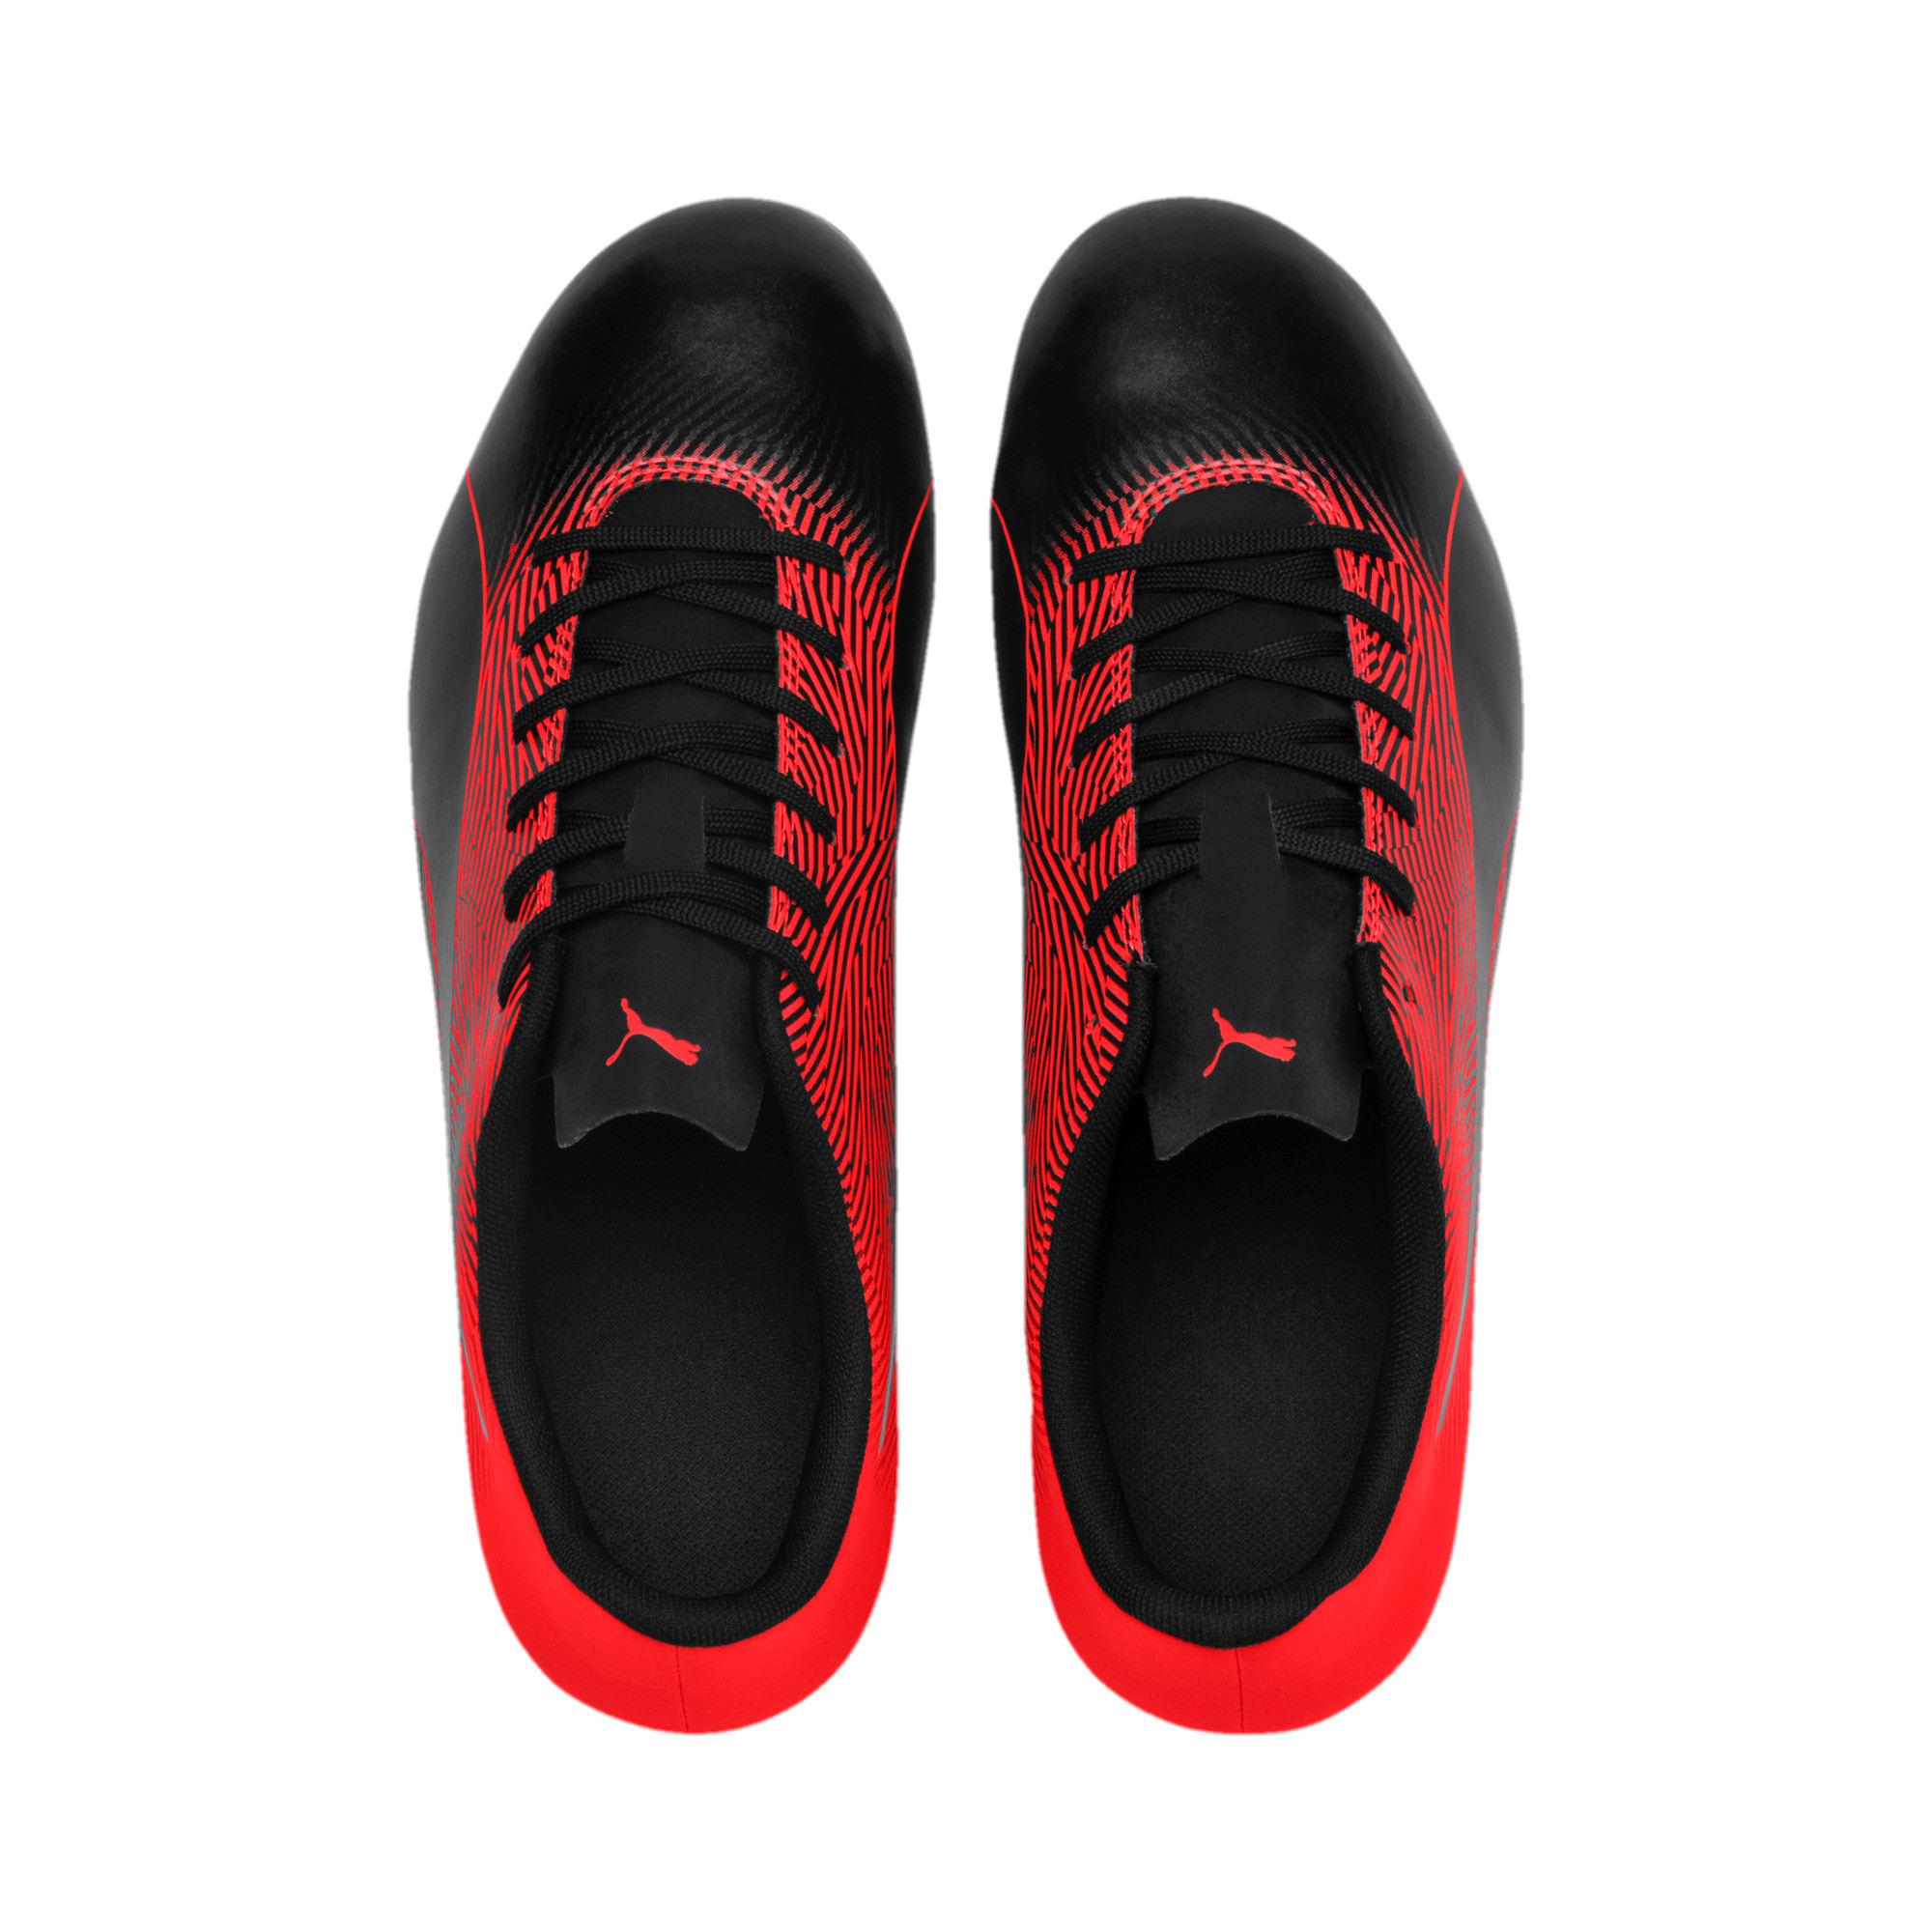 Thumbnail 6 of PUMA Spirit II FG Men's Soccer Cleats, Puma Black-Red Blast, medium